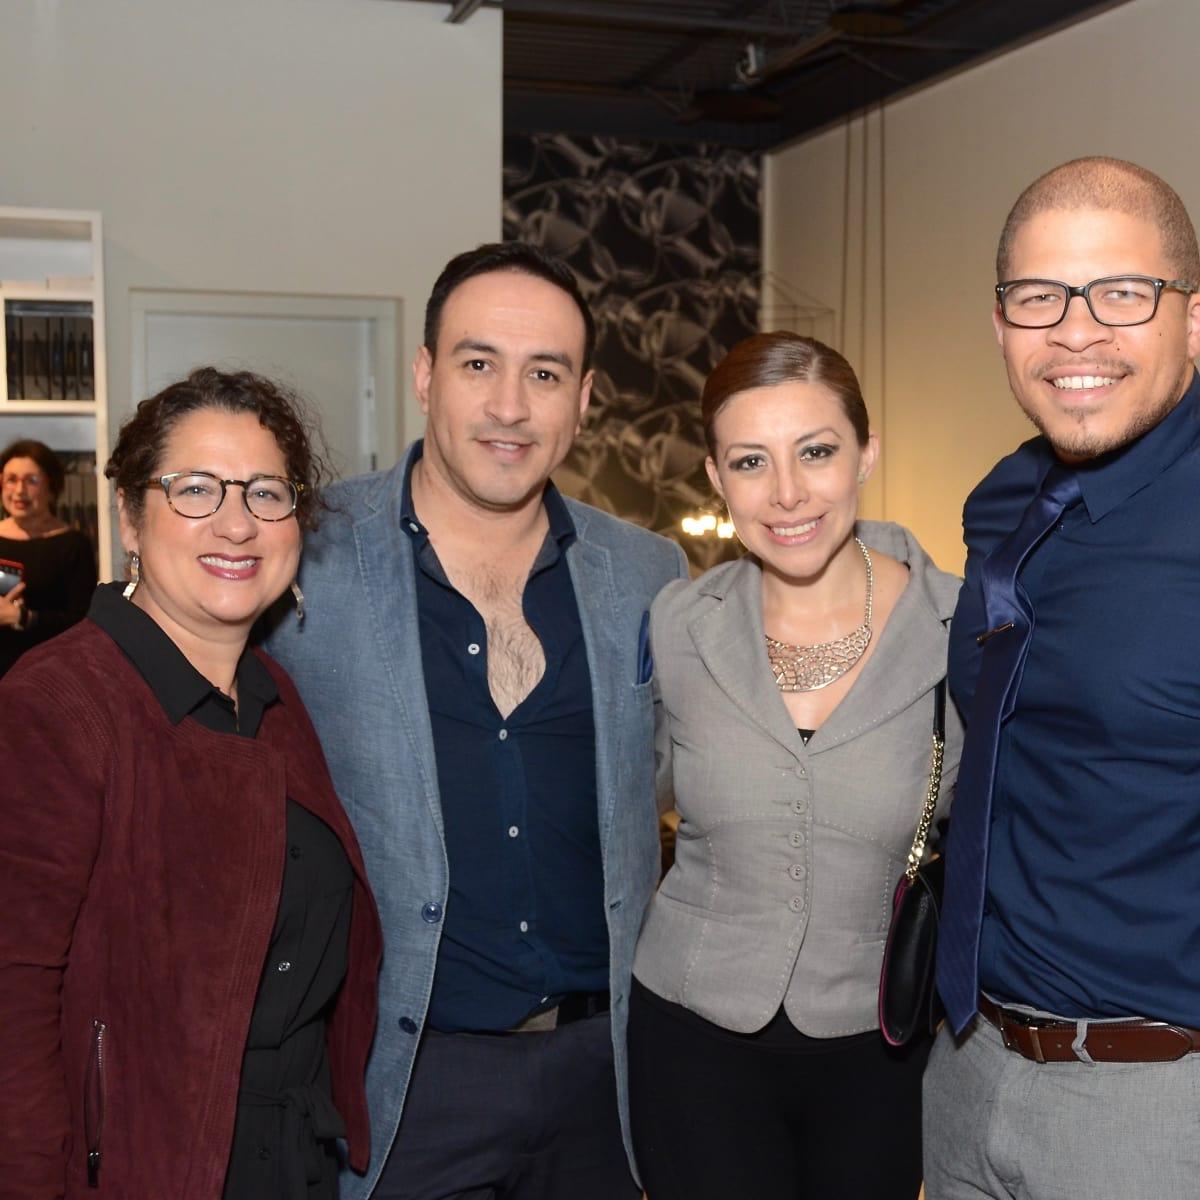 BeDesign cocktail party, Gisella de Ponton, Andres Vanegas, Sophia Hernandez, Christopher Davis